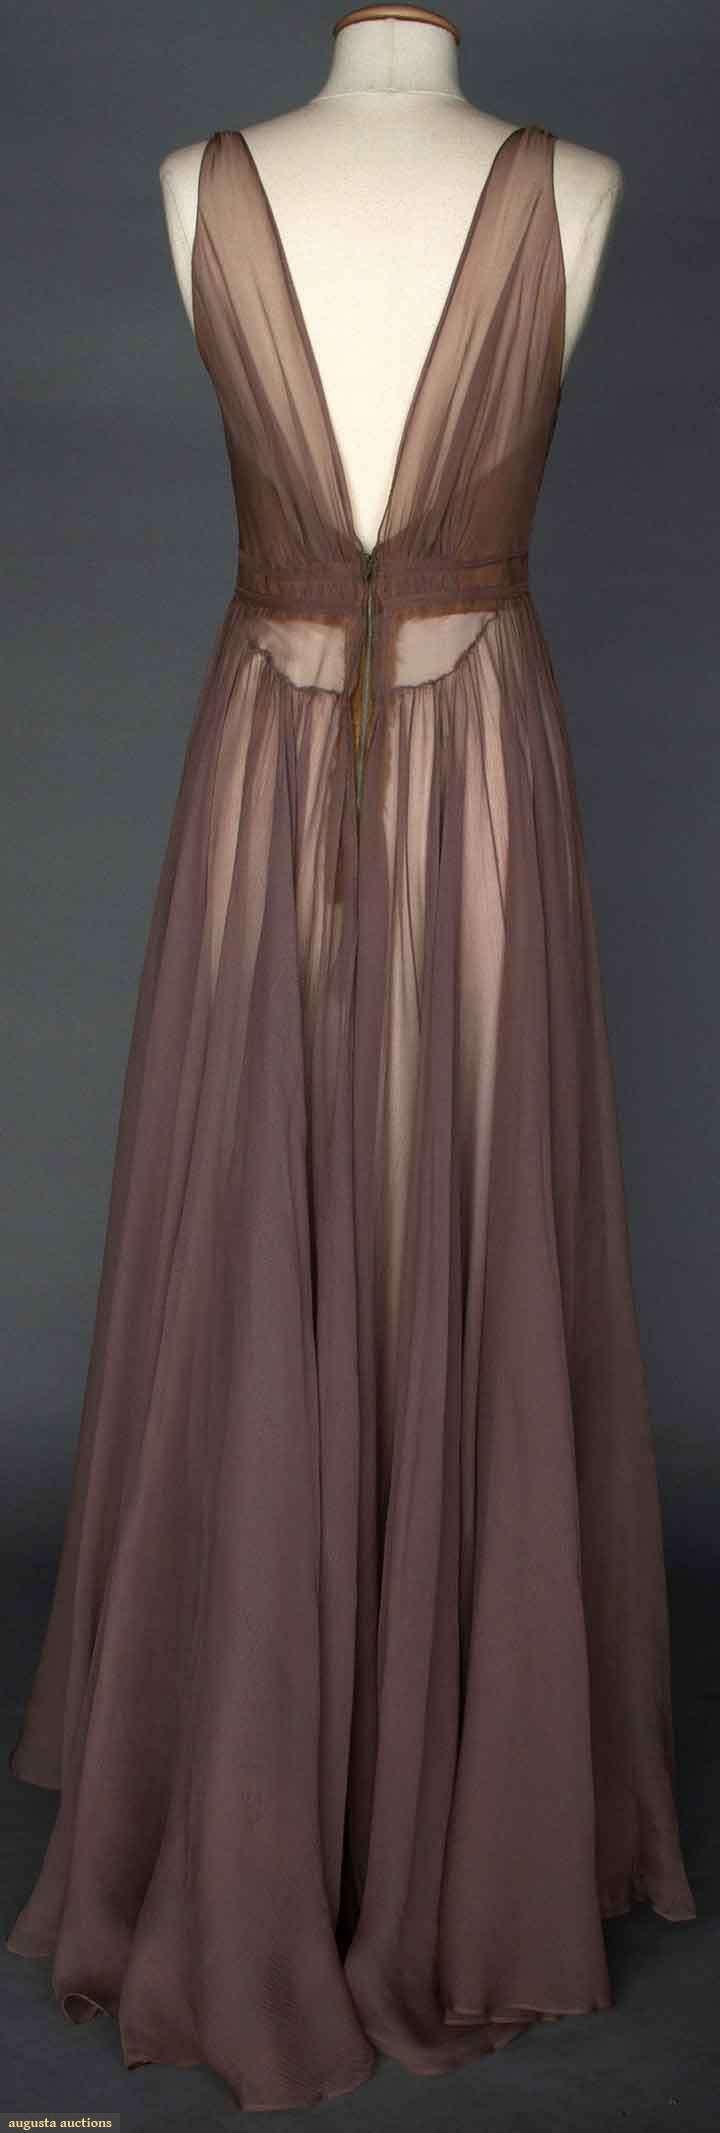 Evening Gown (image 3) | Valentina | 1930s | silk chiffon | Augusta Auction | April 9, 2014/Lot 225